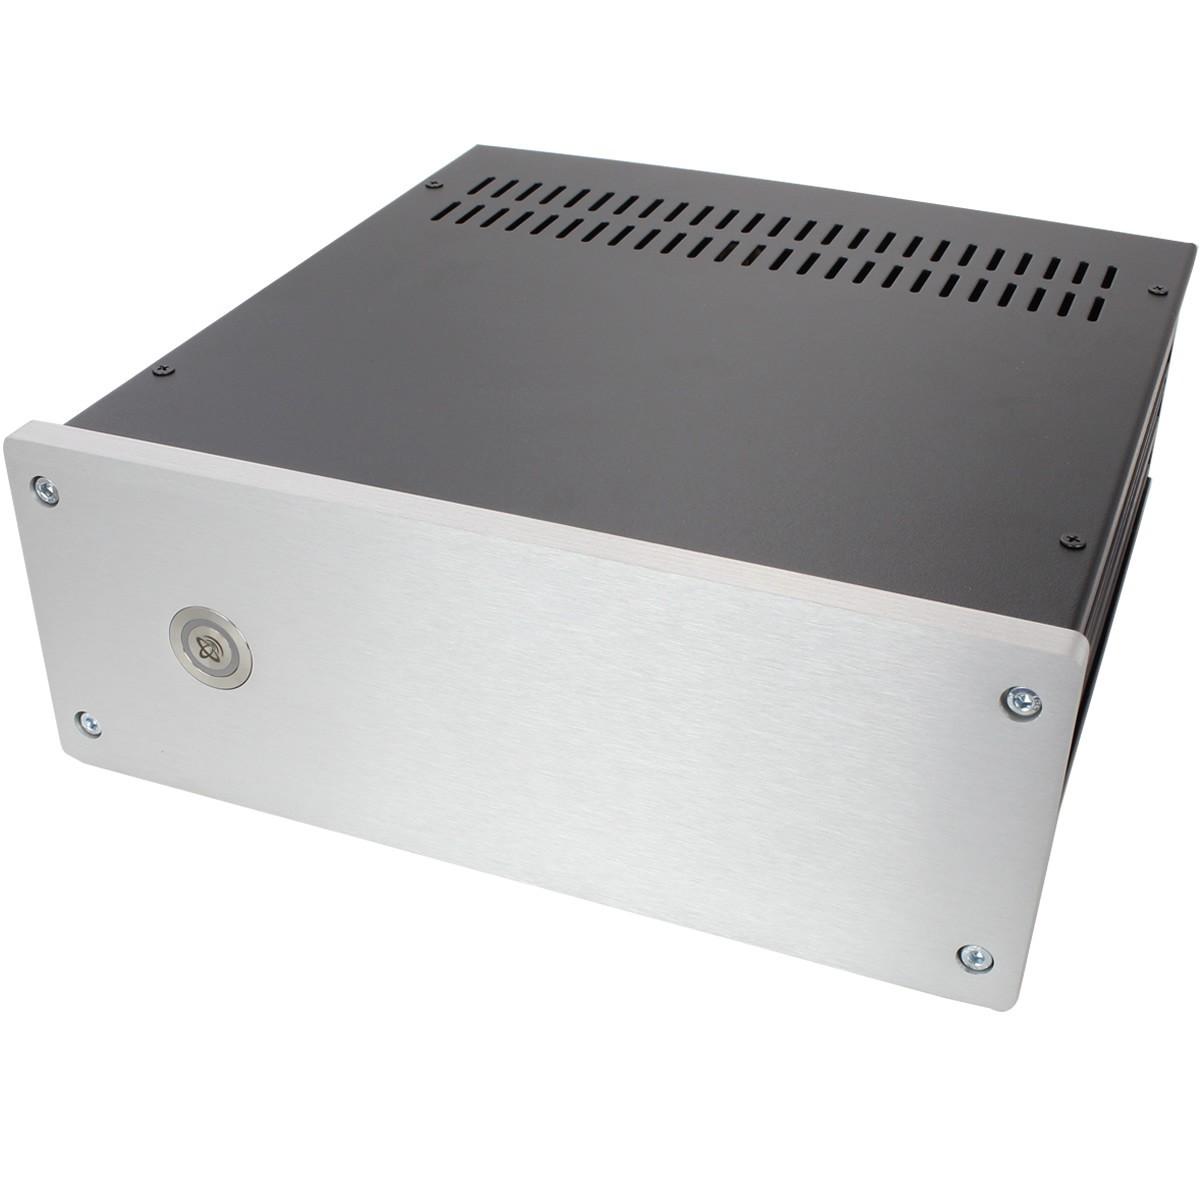 AUDIOPHONICS TRIPATH TA2022 DIY Stereo Amplifier Kit Silver 60W 8Ohm